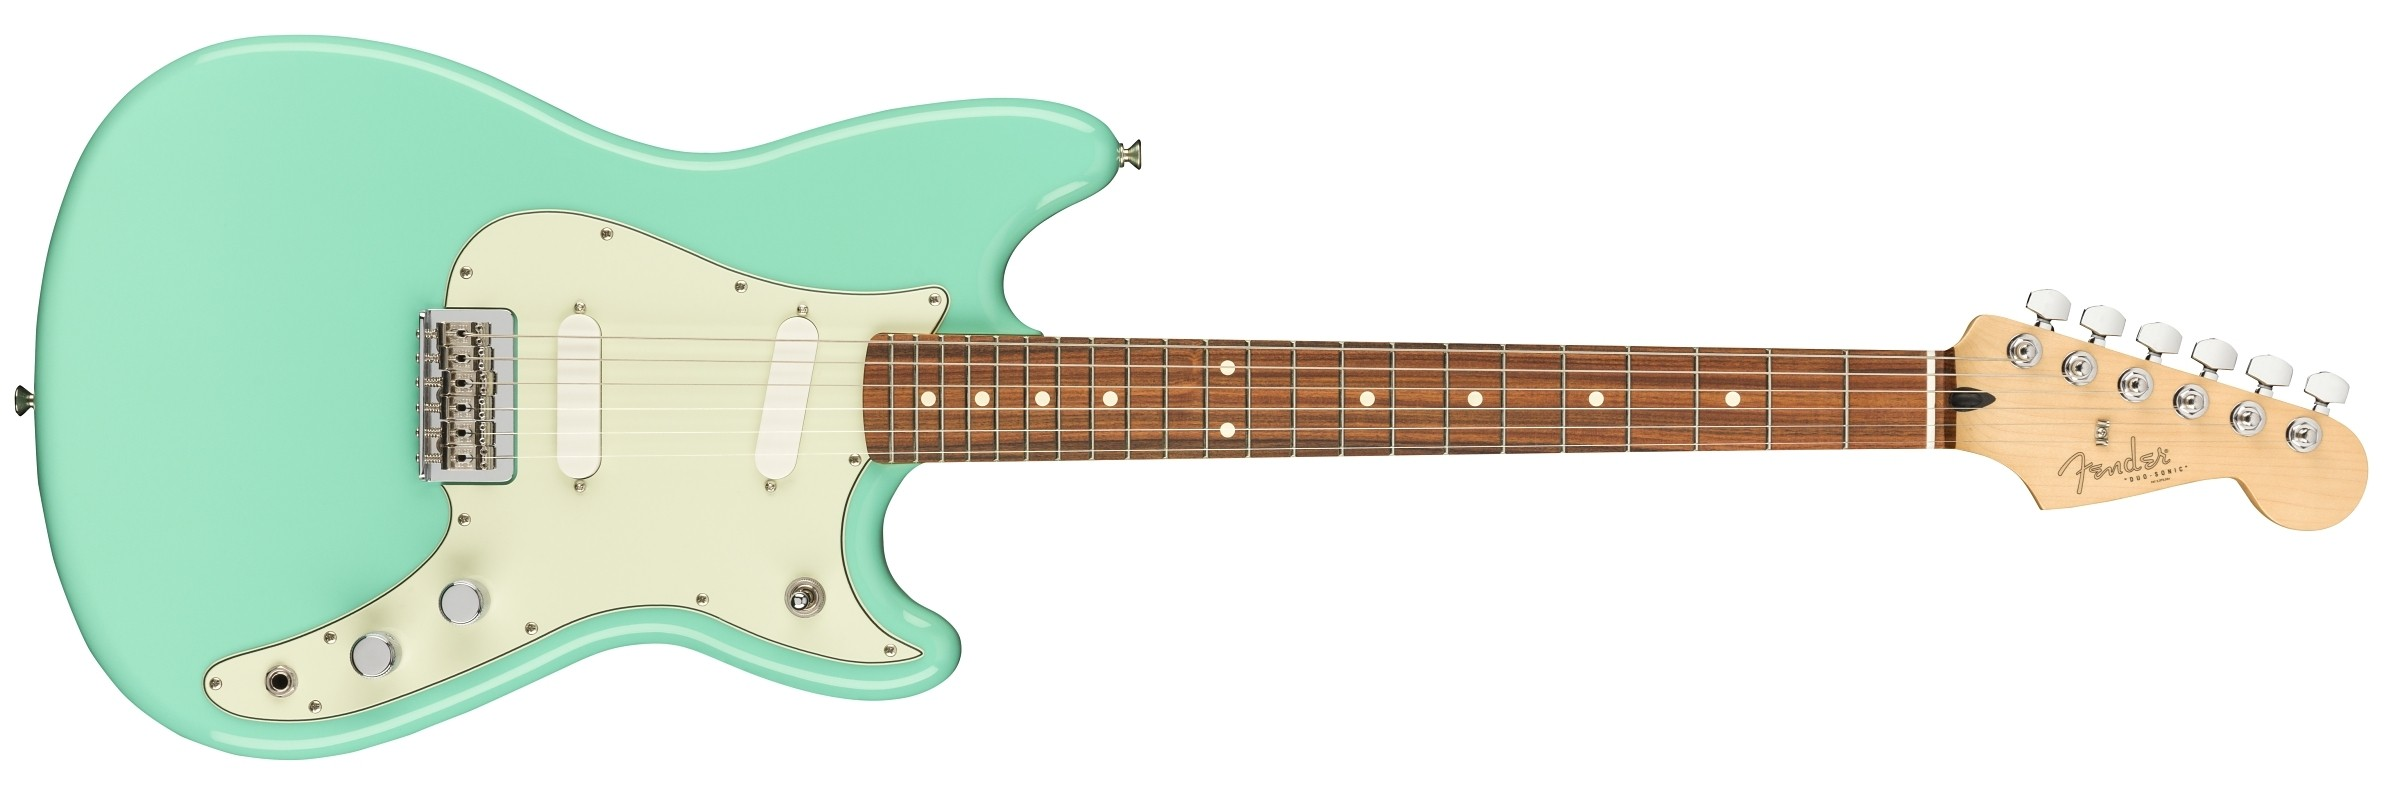 Fender Player Duo-Sonic - Seafoam Green